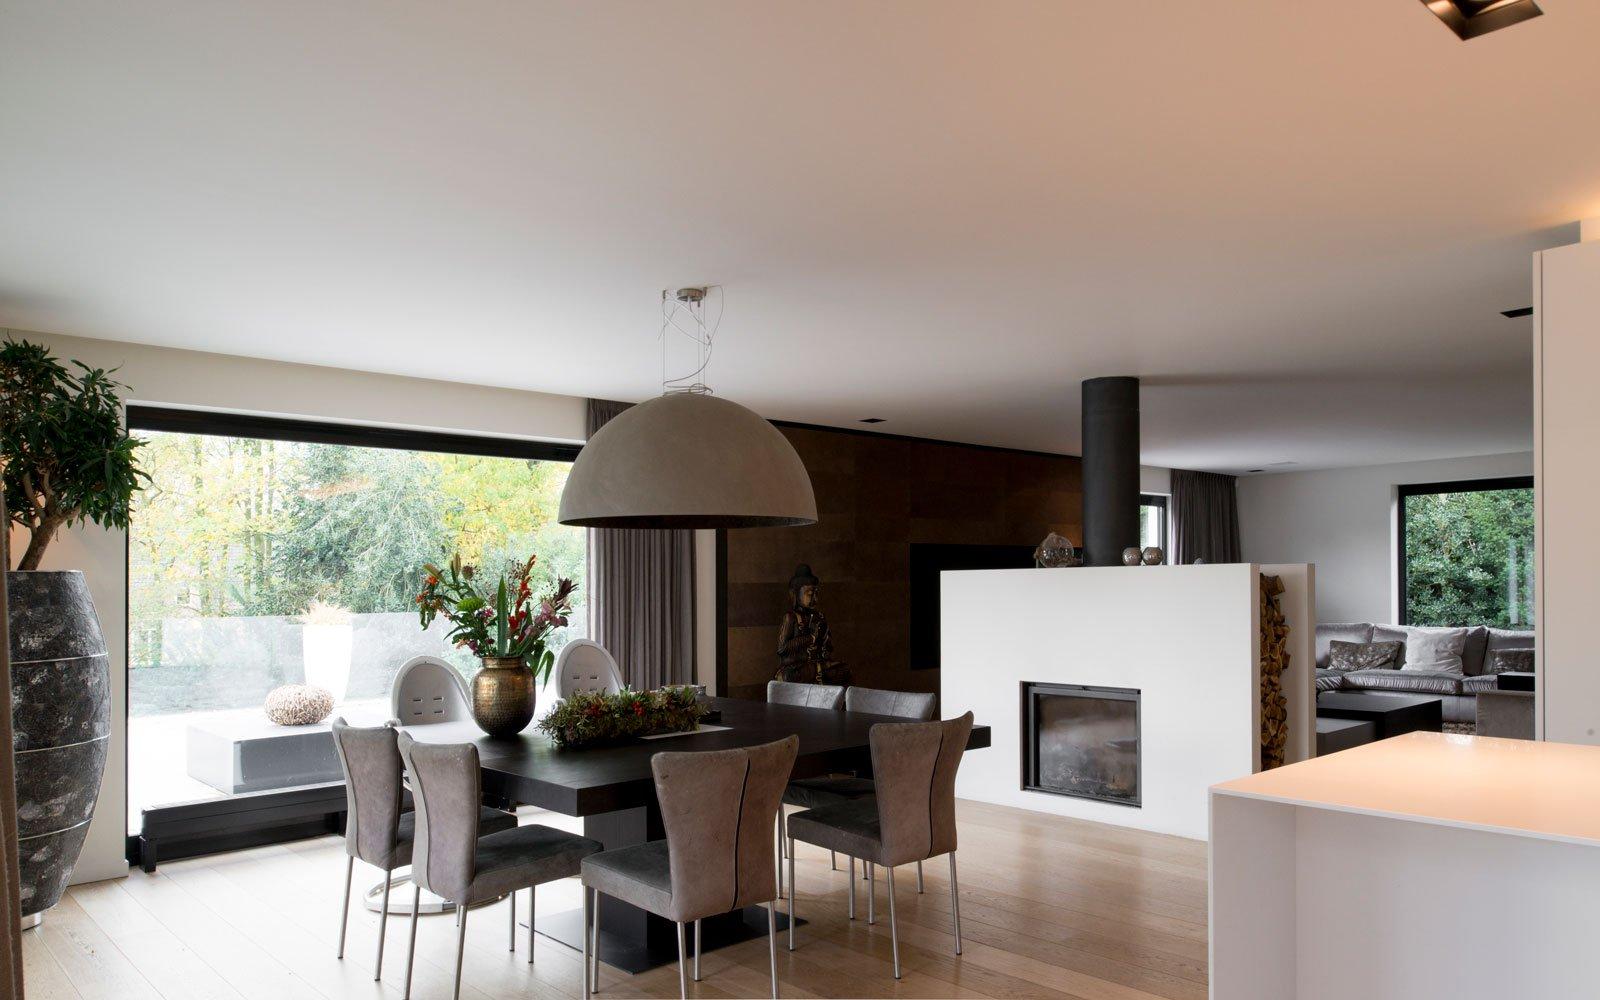 Woonkamer, eettafel, sfeervol, open haard, tunnelhaard, Stuv, moderne villa, VVR Architecten